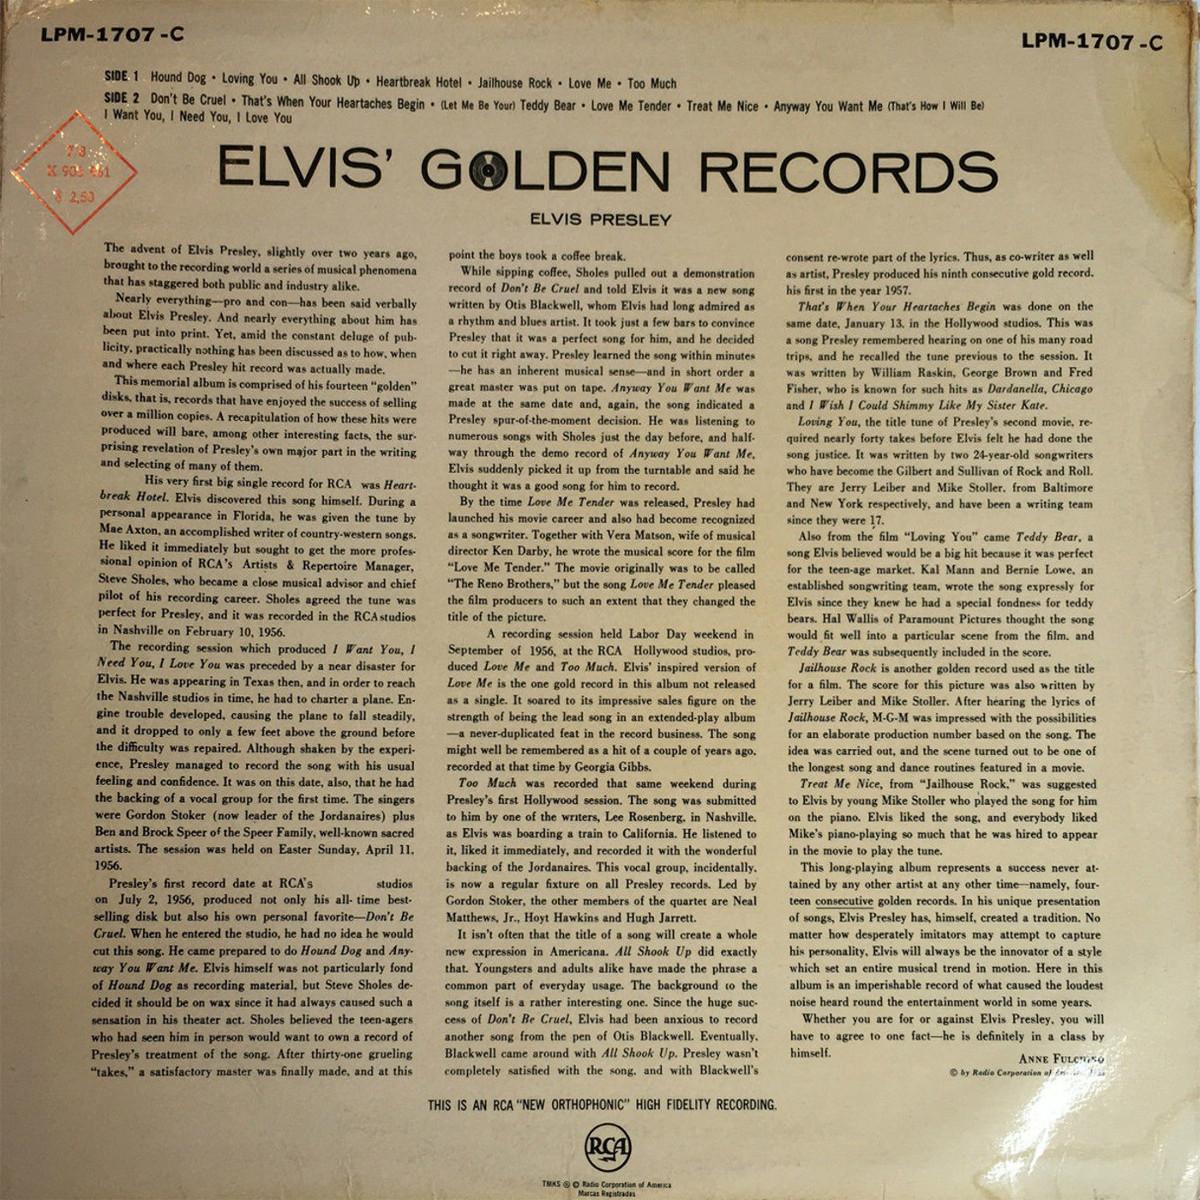 ELVIS' GOLDEN RECORDS 1275yxwx